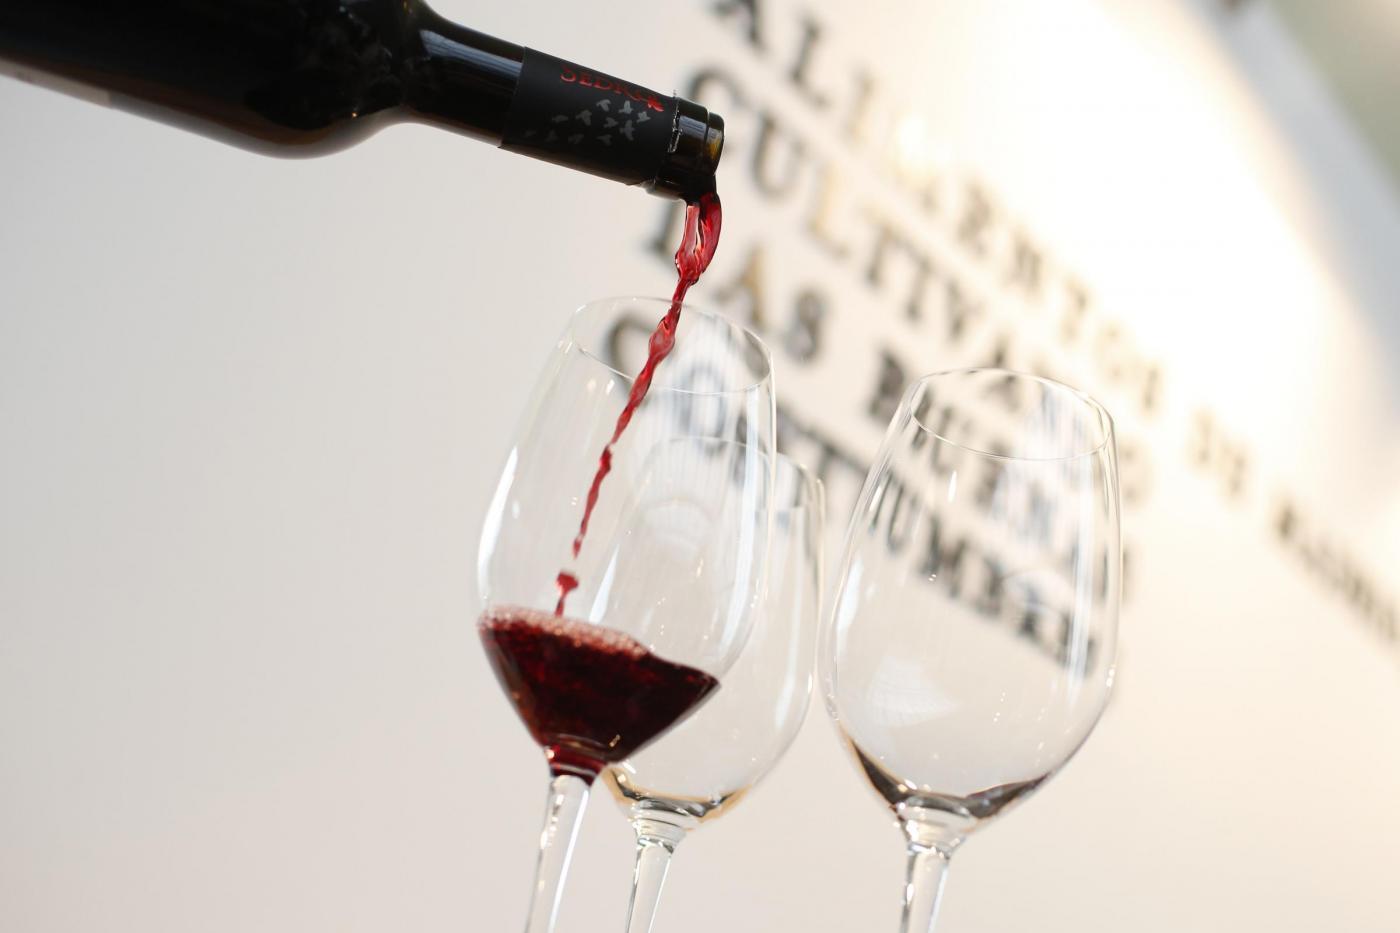 I 12 segreti del vino che non conoscevi